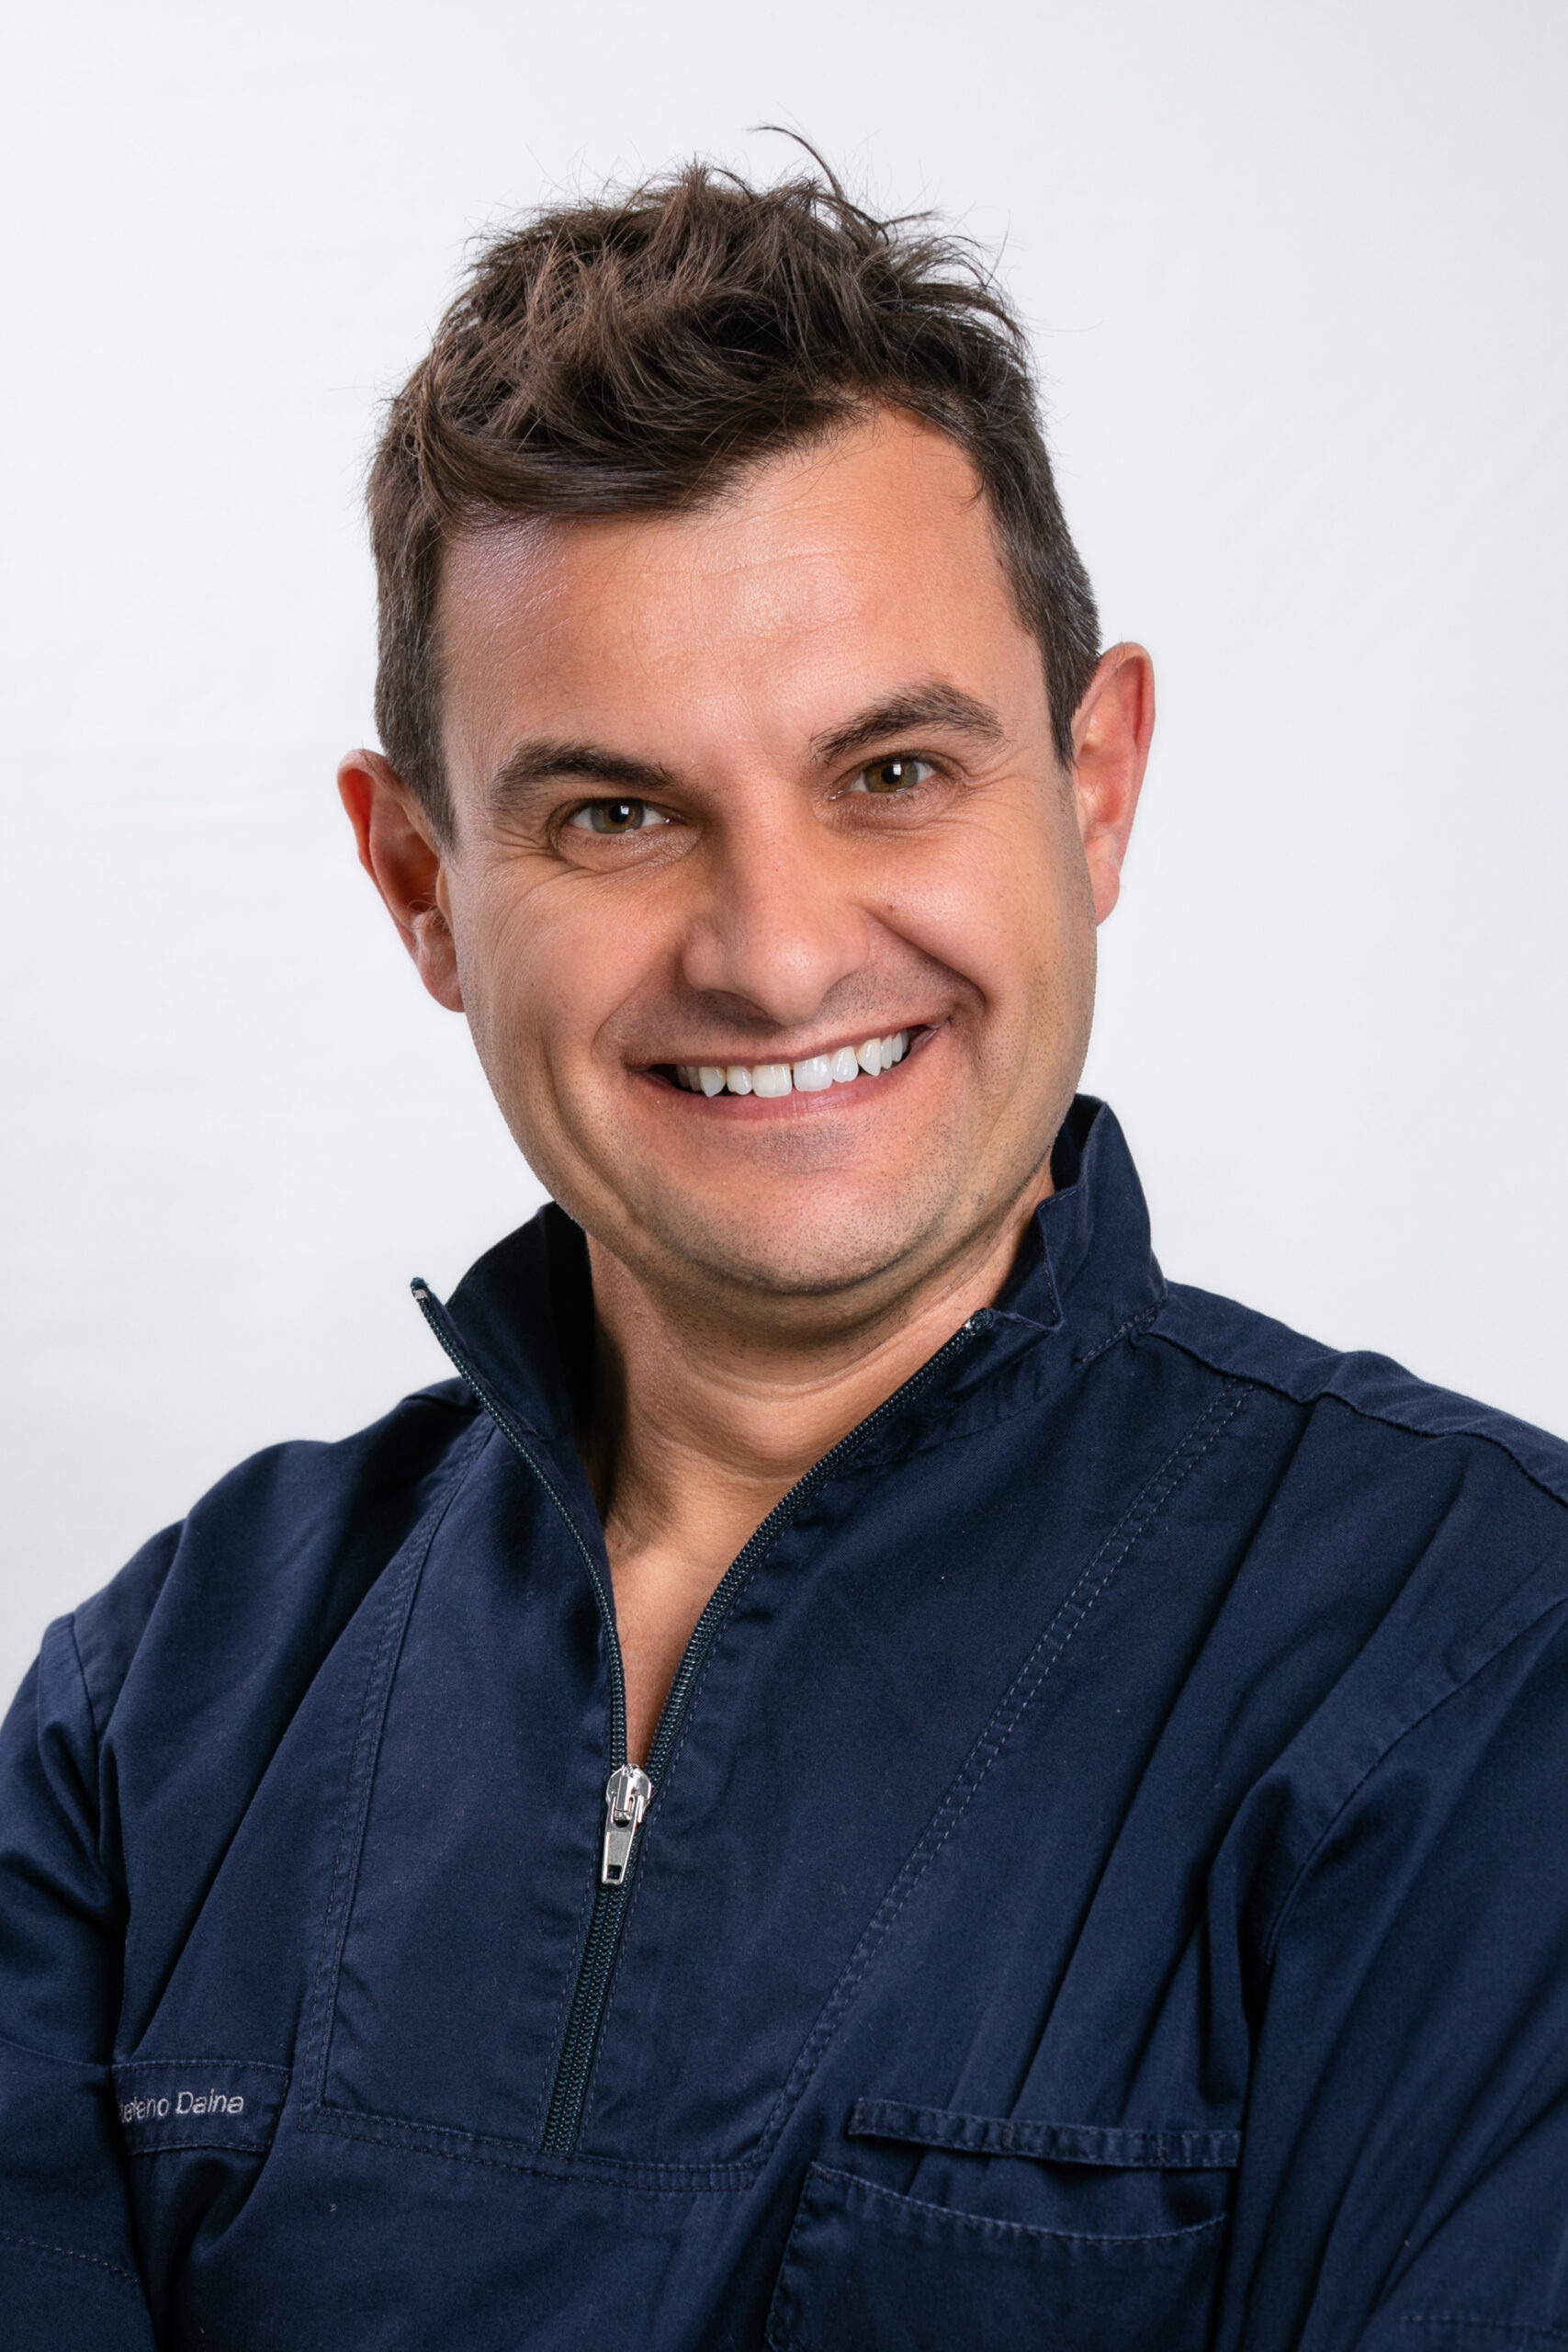 Dott. Stefano Daina